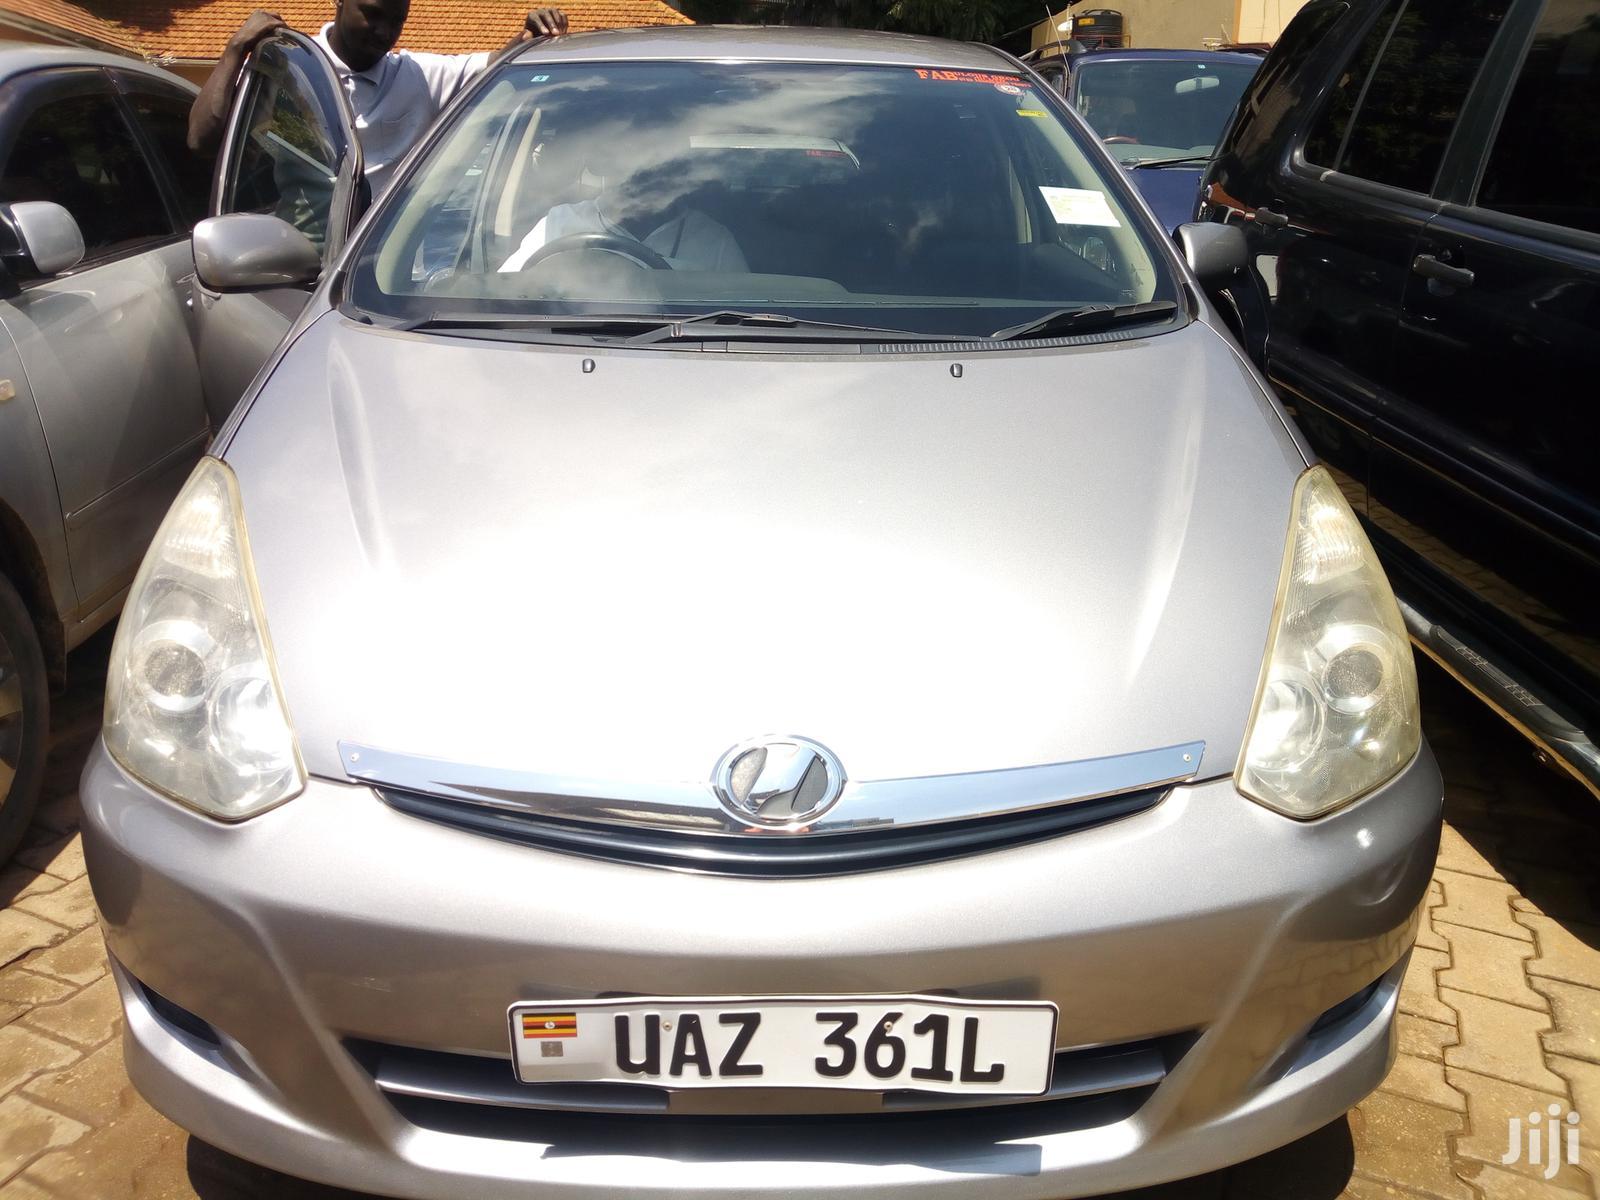 Toyota Wish 2007 Beige | Cars for sale in Kampala, Central Region, Uganda